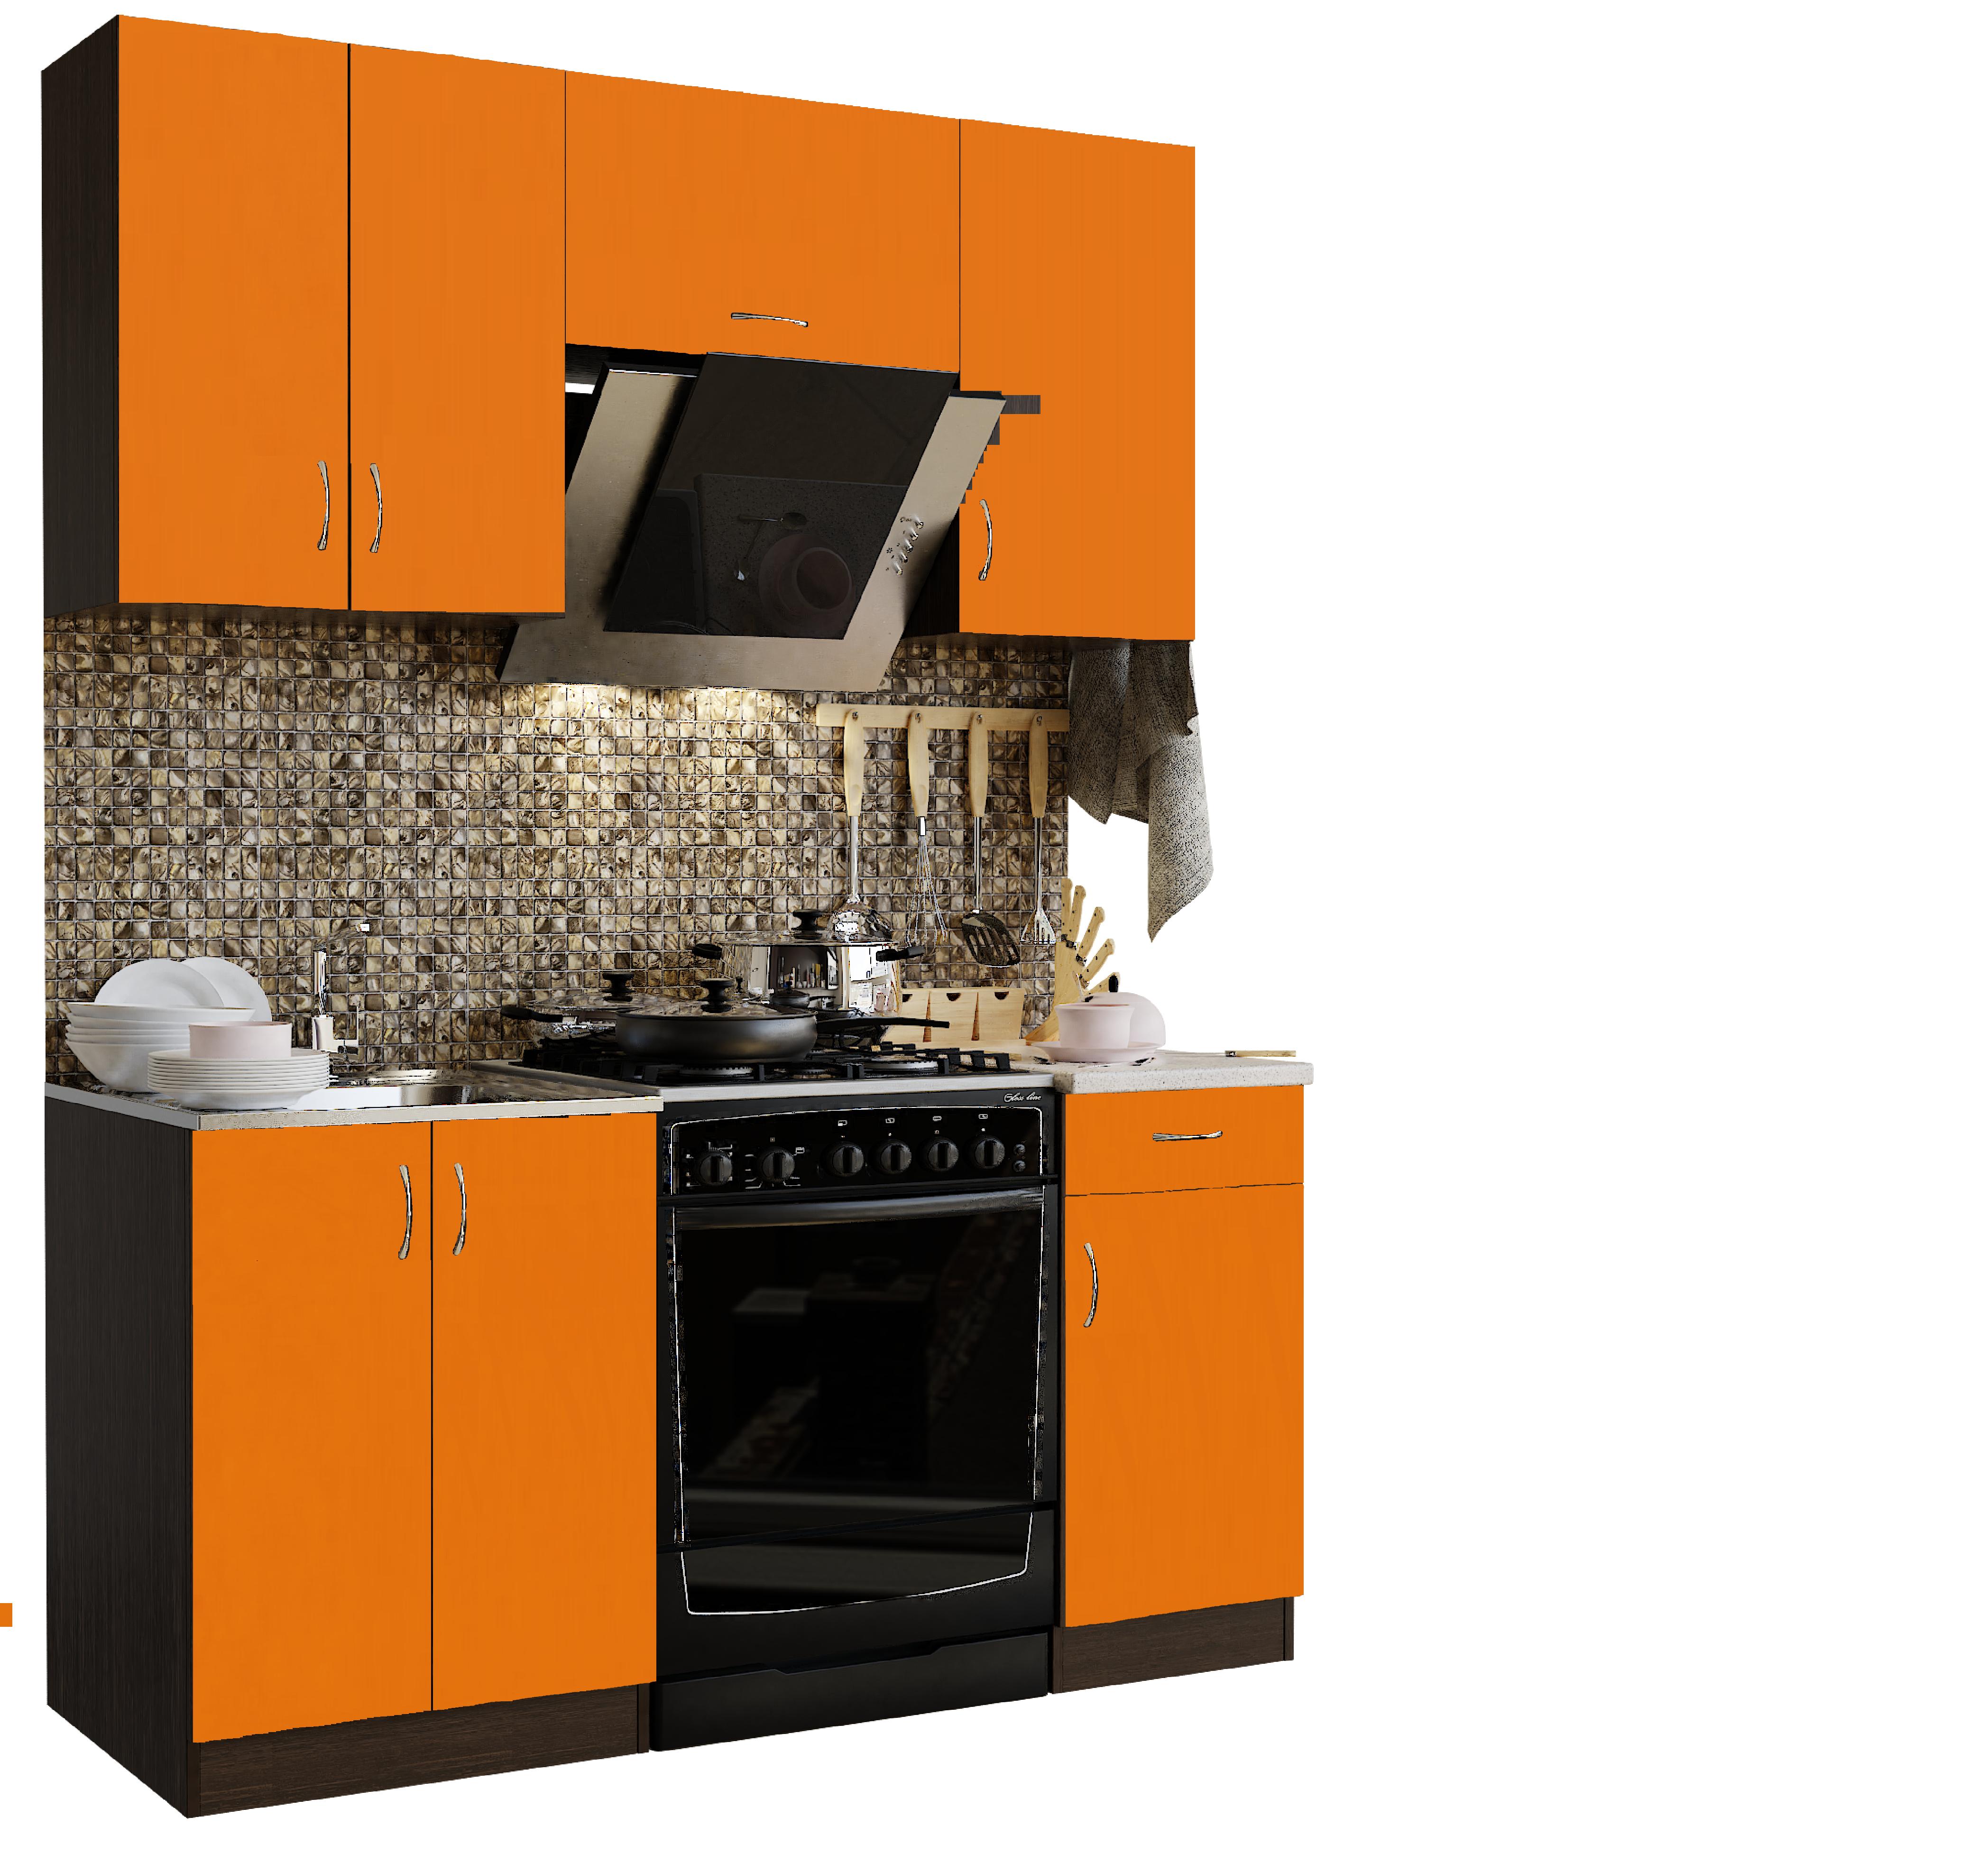 Кухонный гарнитур Sanvut ГК1600-3.13.2(1) Венге / Оранж